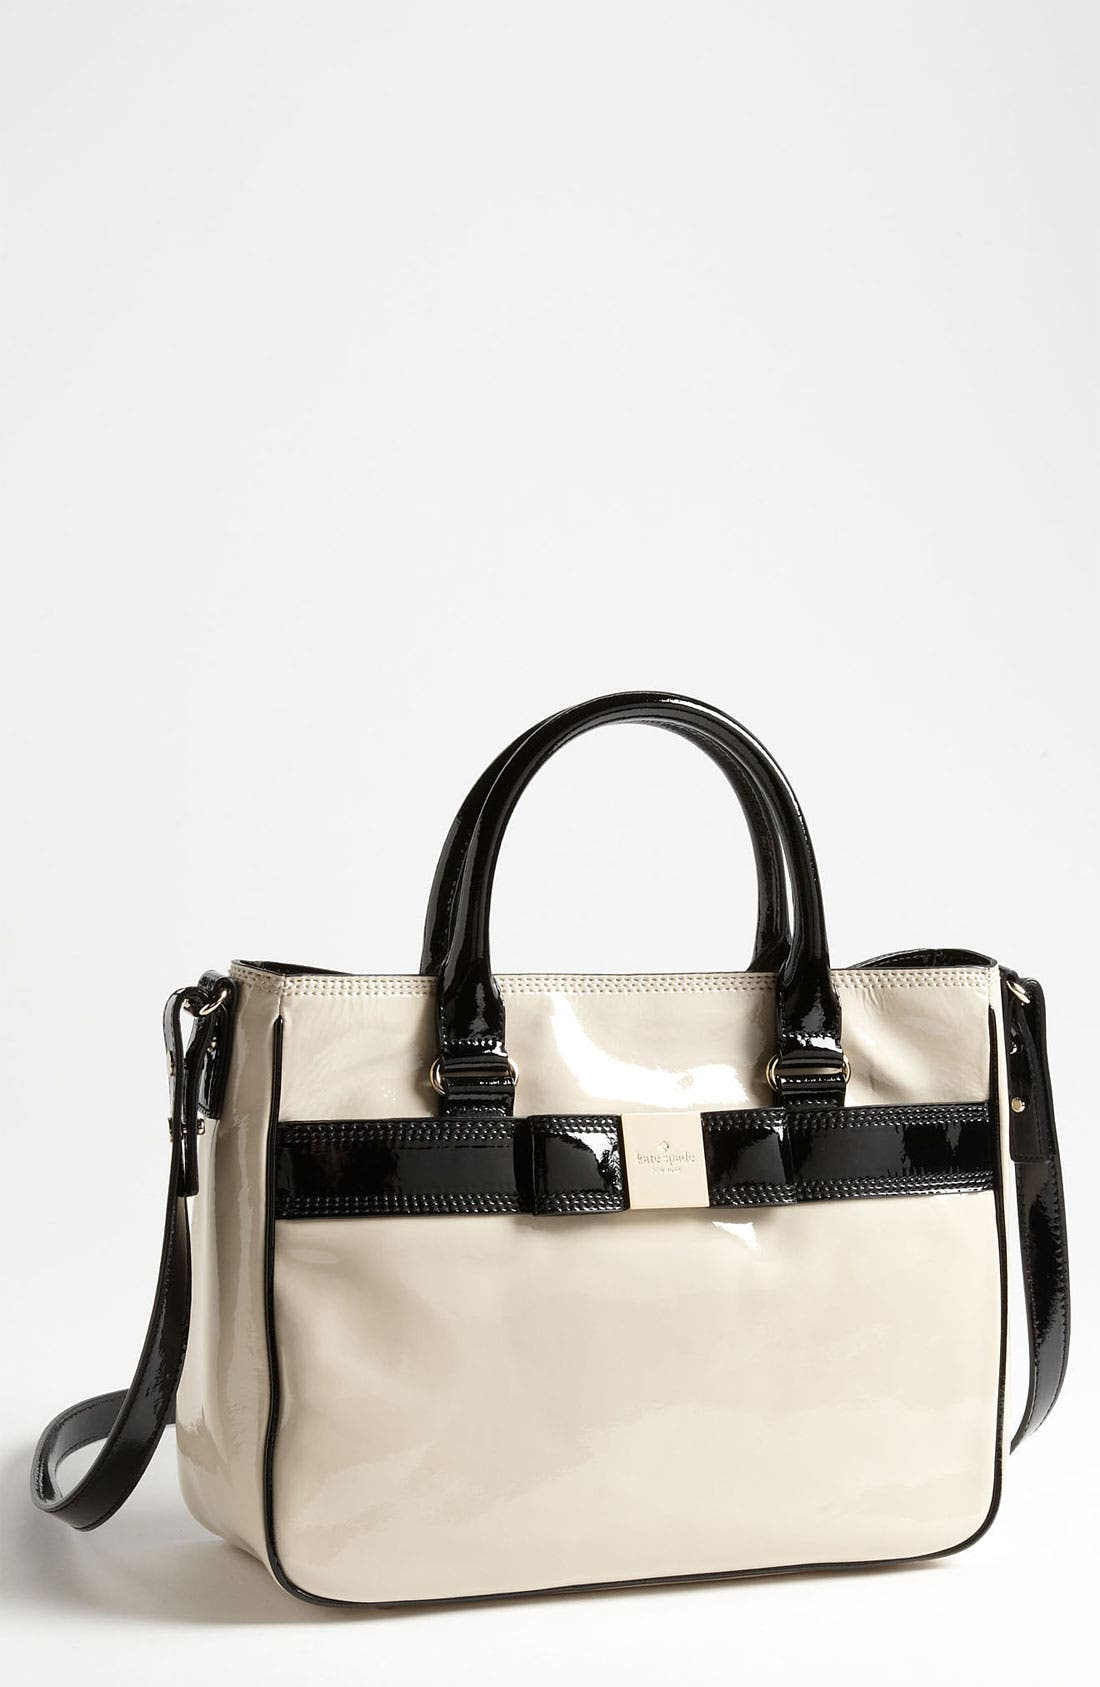 Main Image - kate spade new york 'primrose hill - goldie' handbag